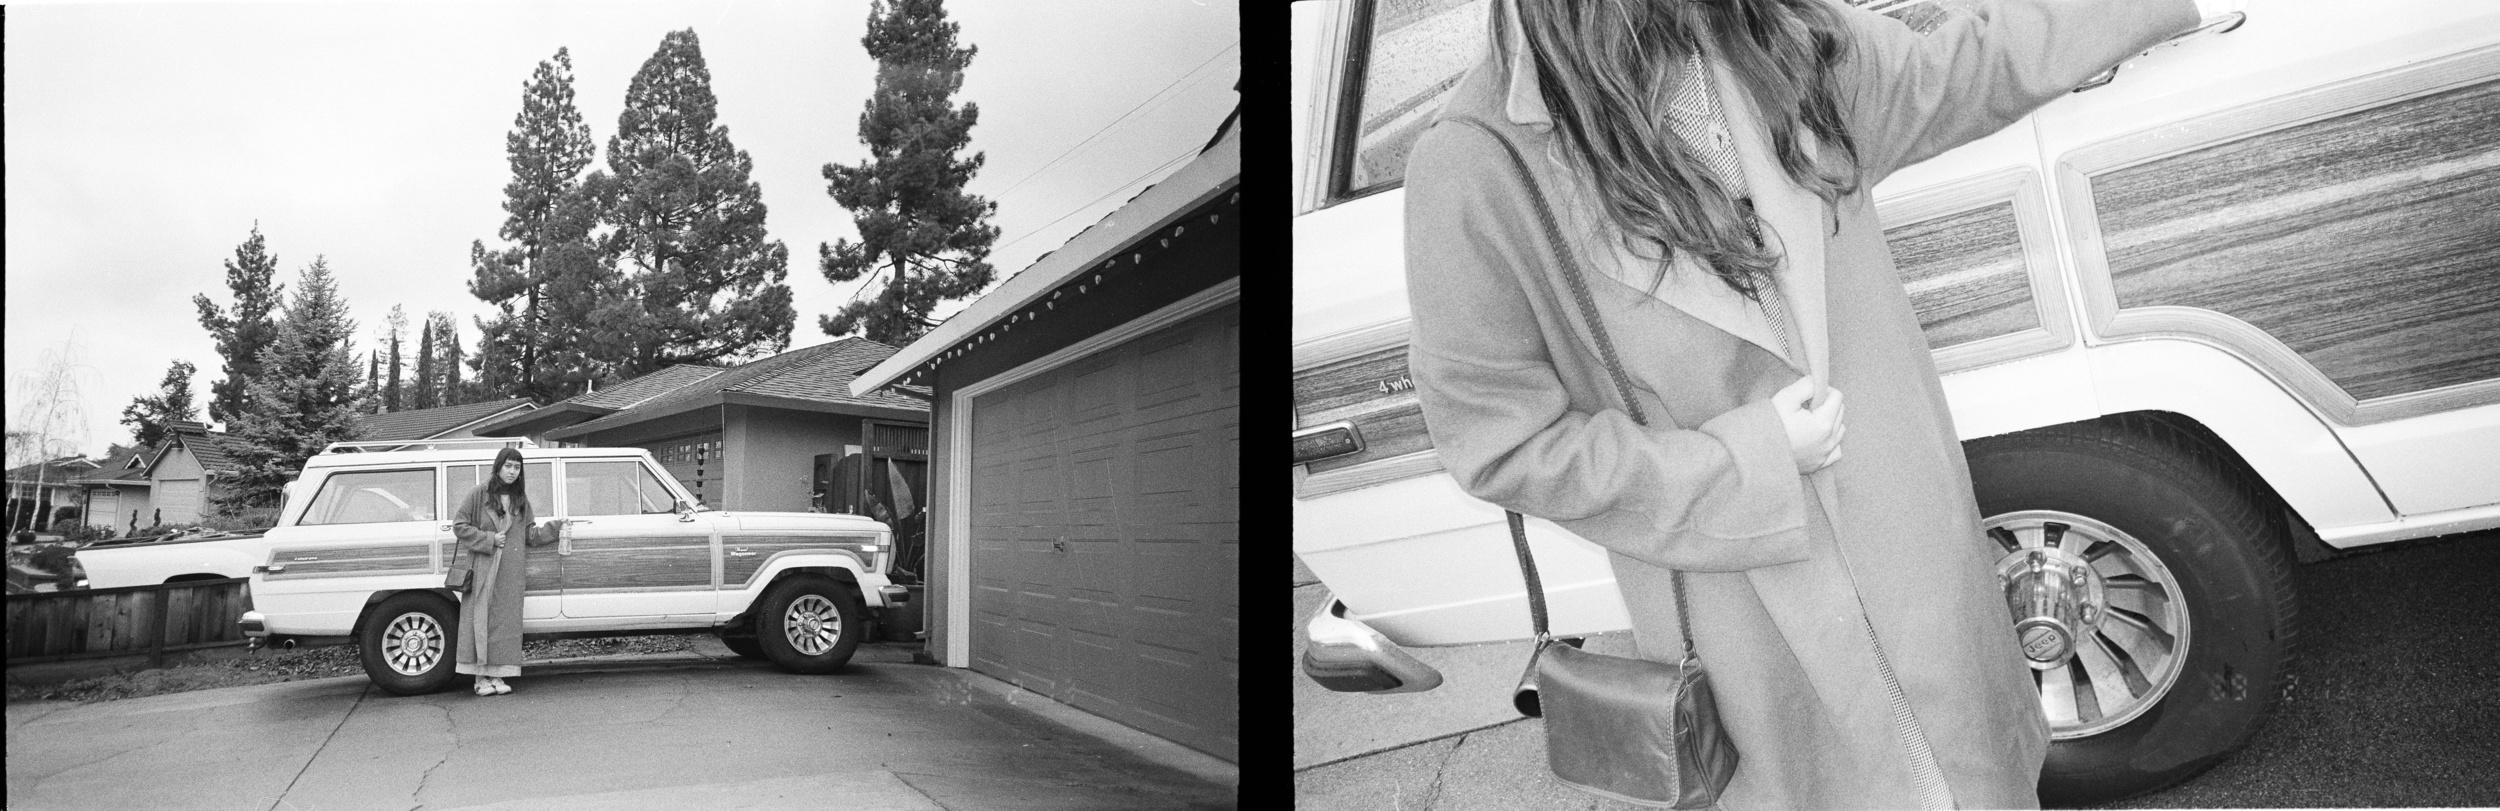 Justine&Car.jpeg